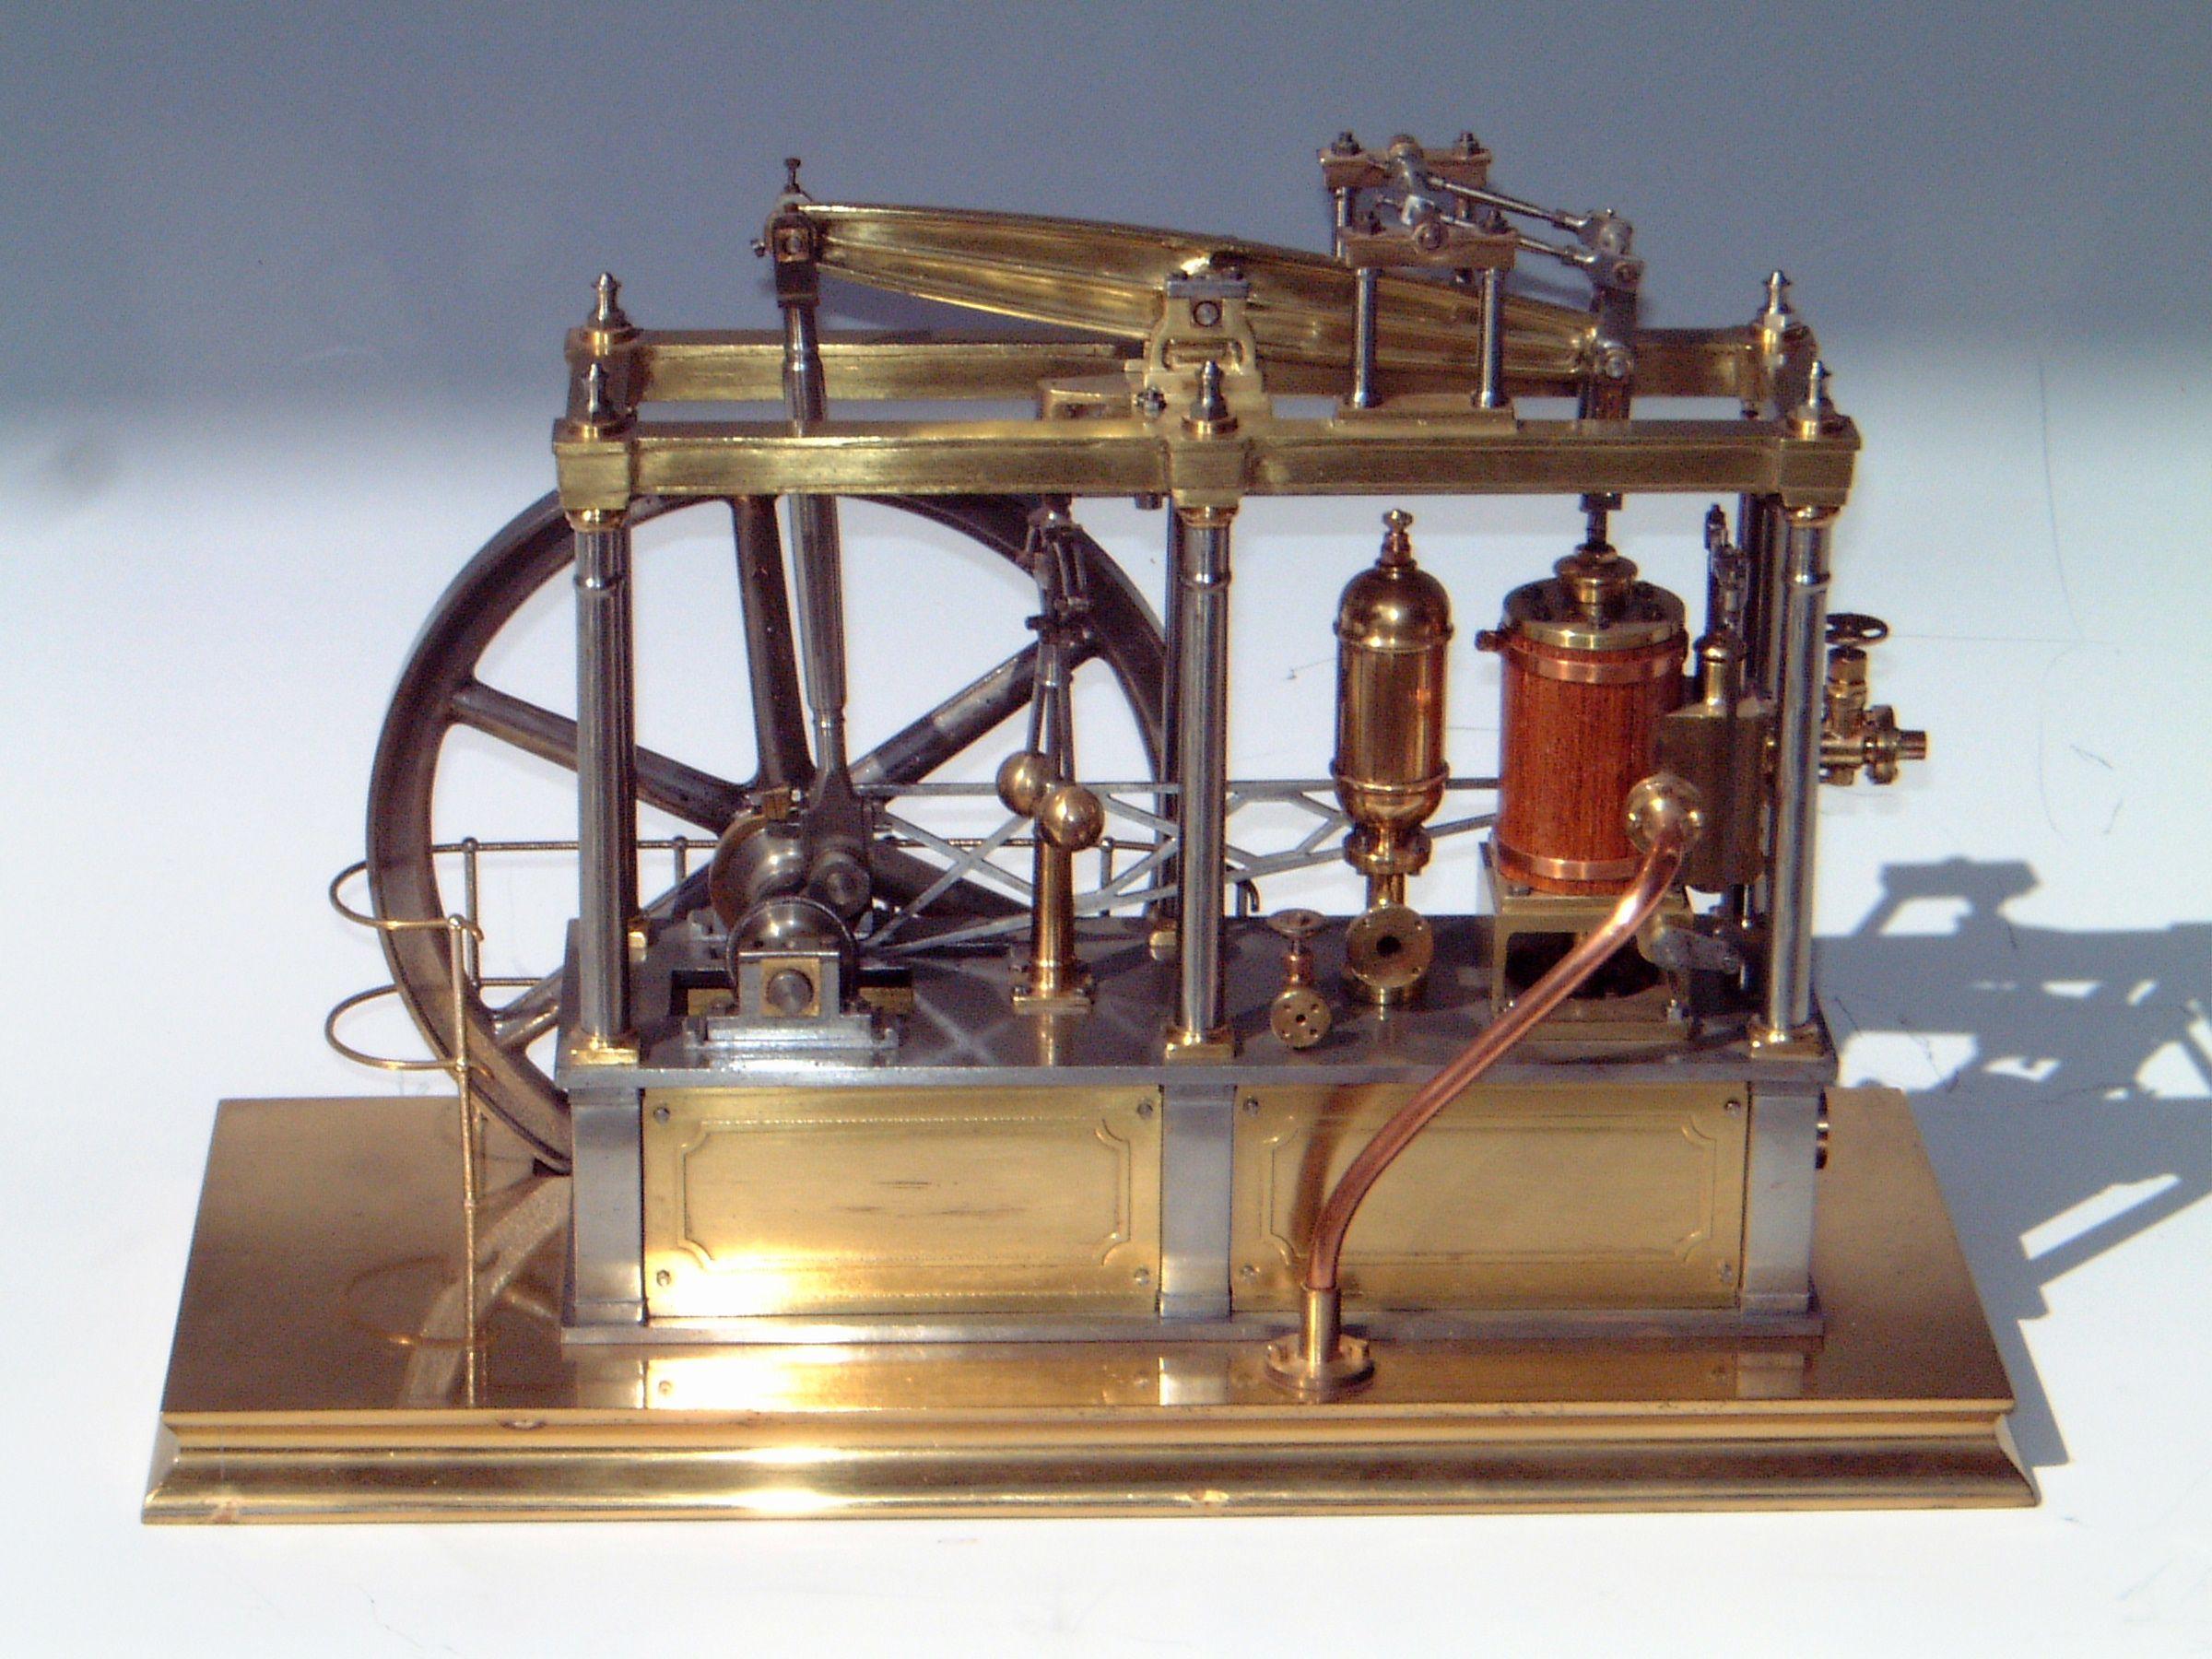 Ladiy Stephanie | Steam engine, Live steam models, Stirling